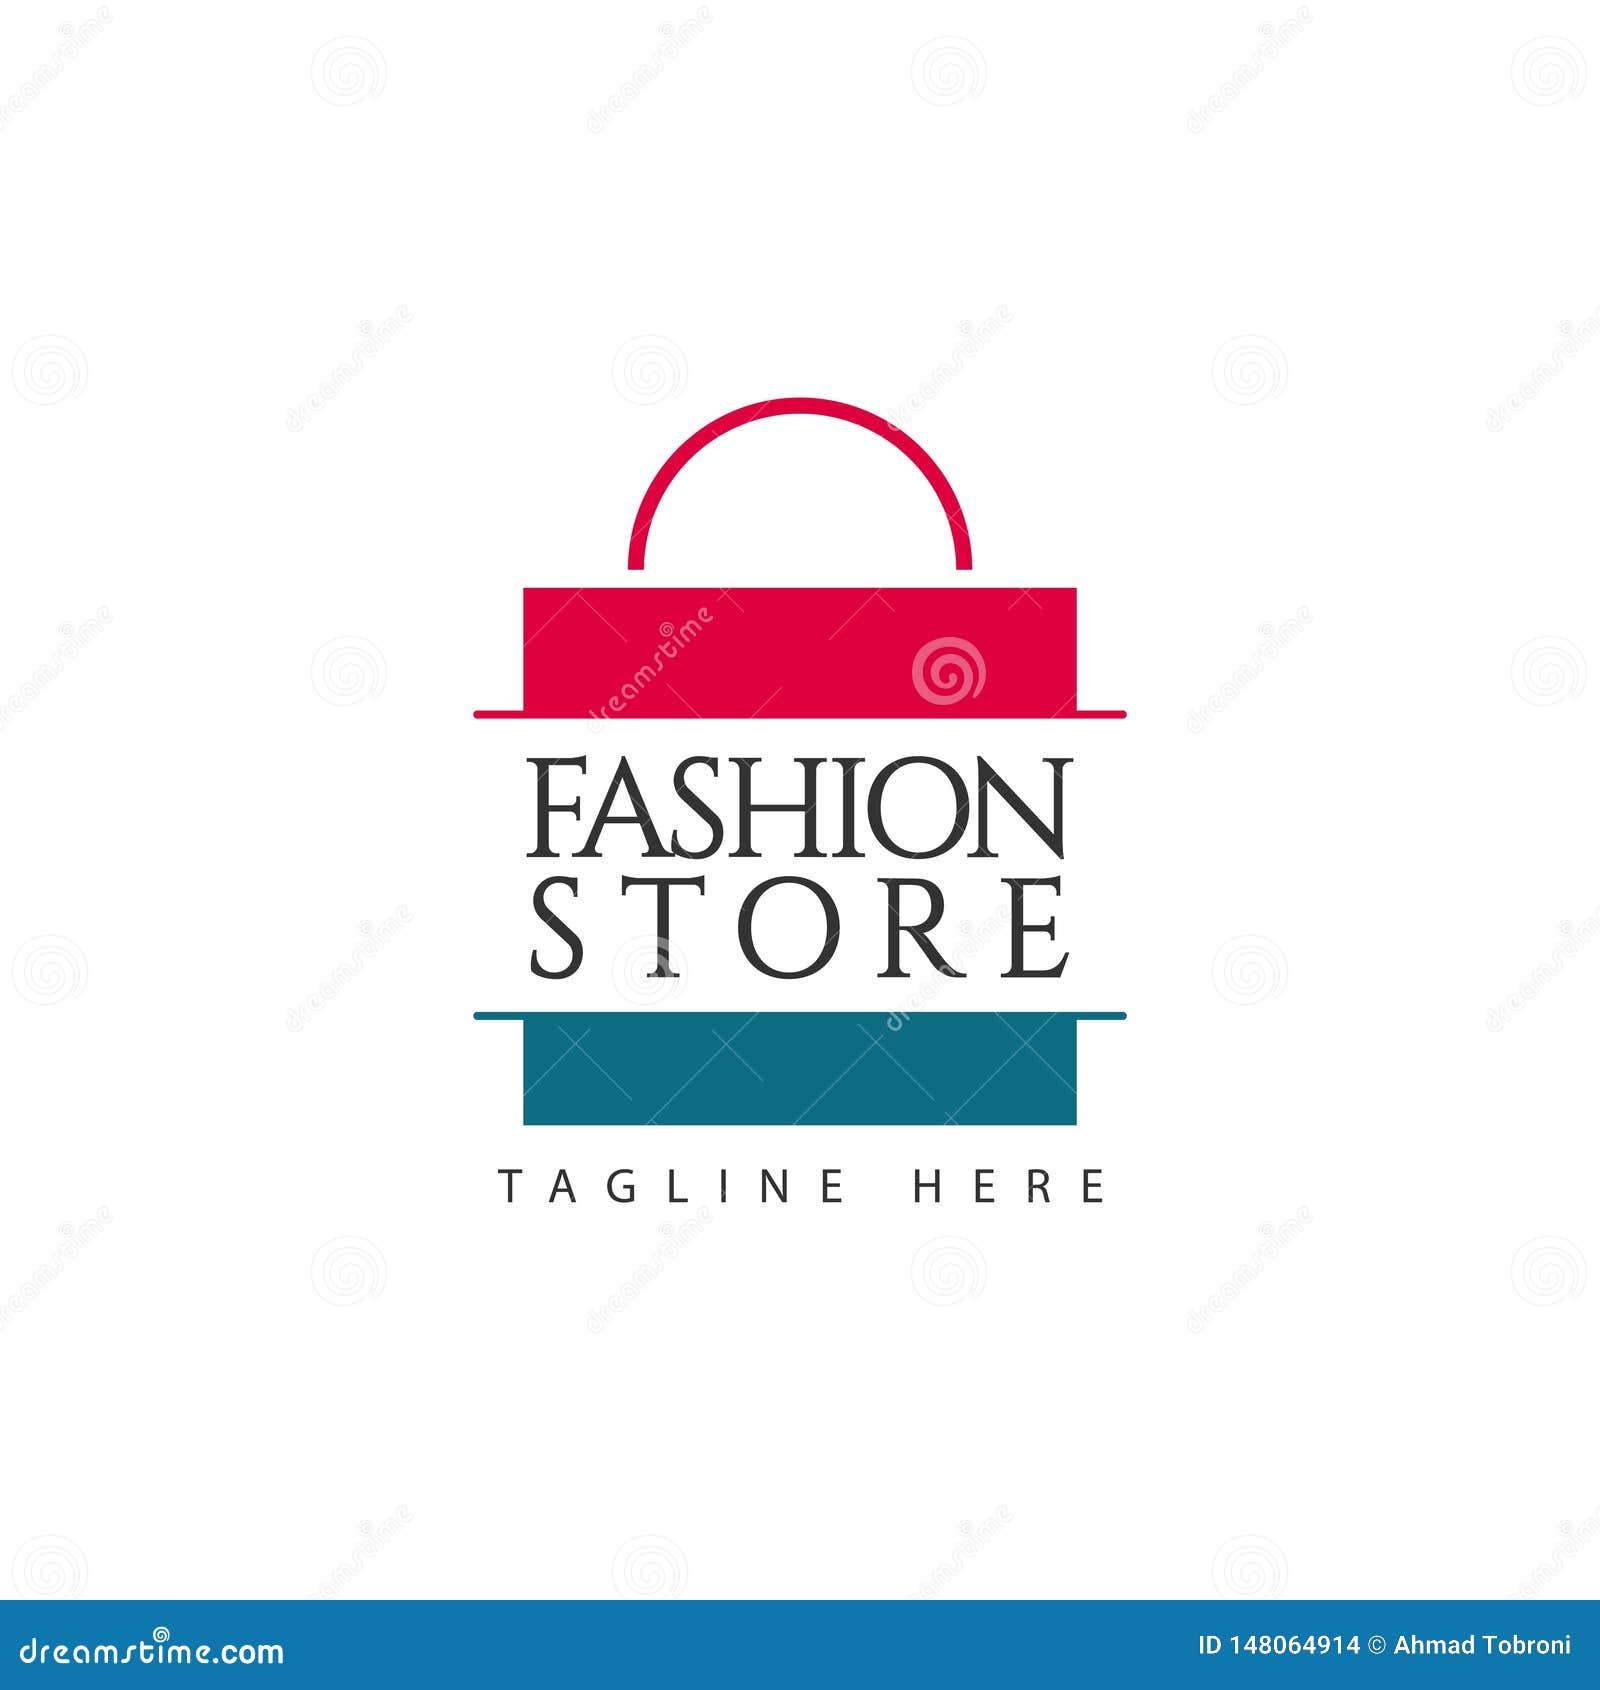 Fashion Store Logo Vector Template Design Illustration Stock Vector Illustration Of Template Fashion 148064914